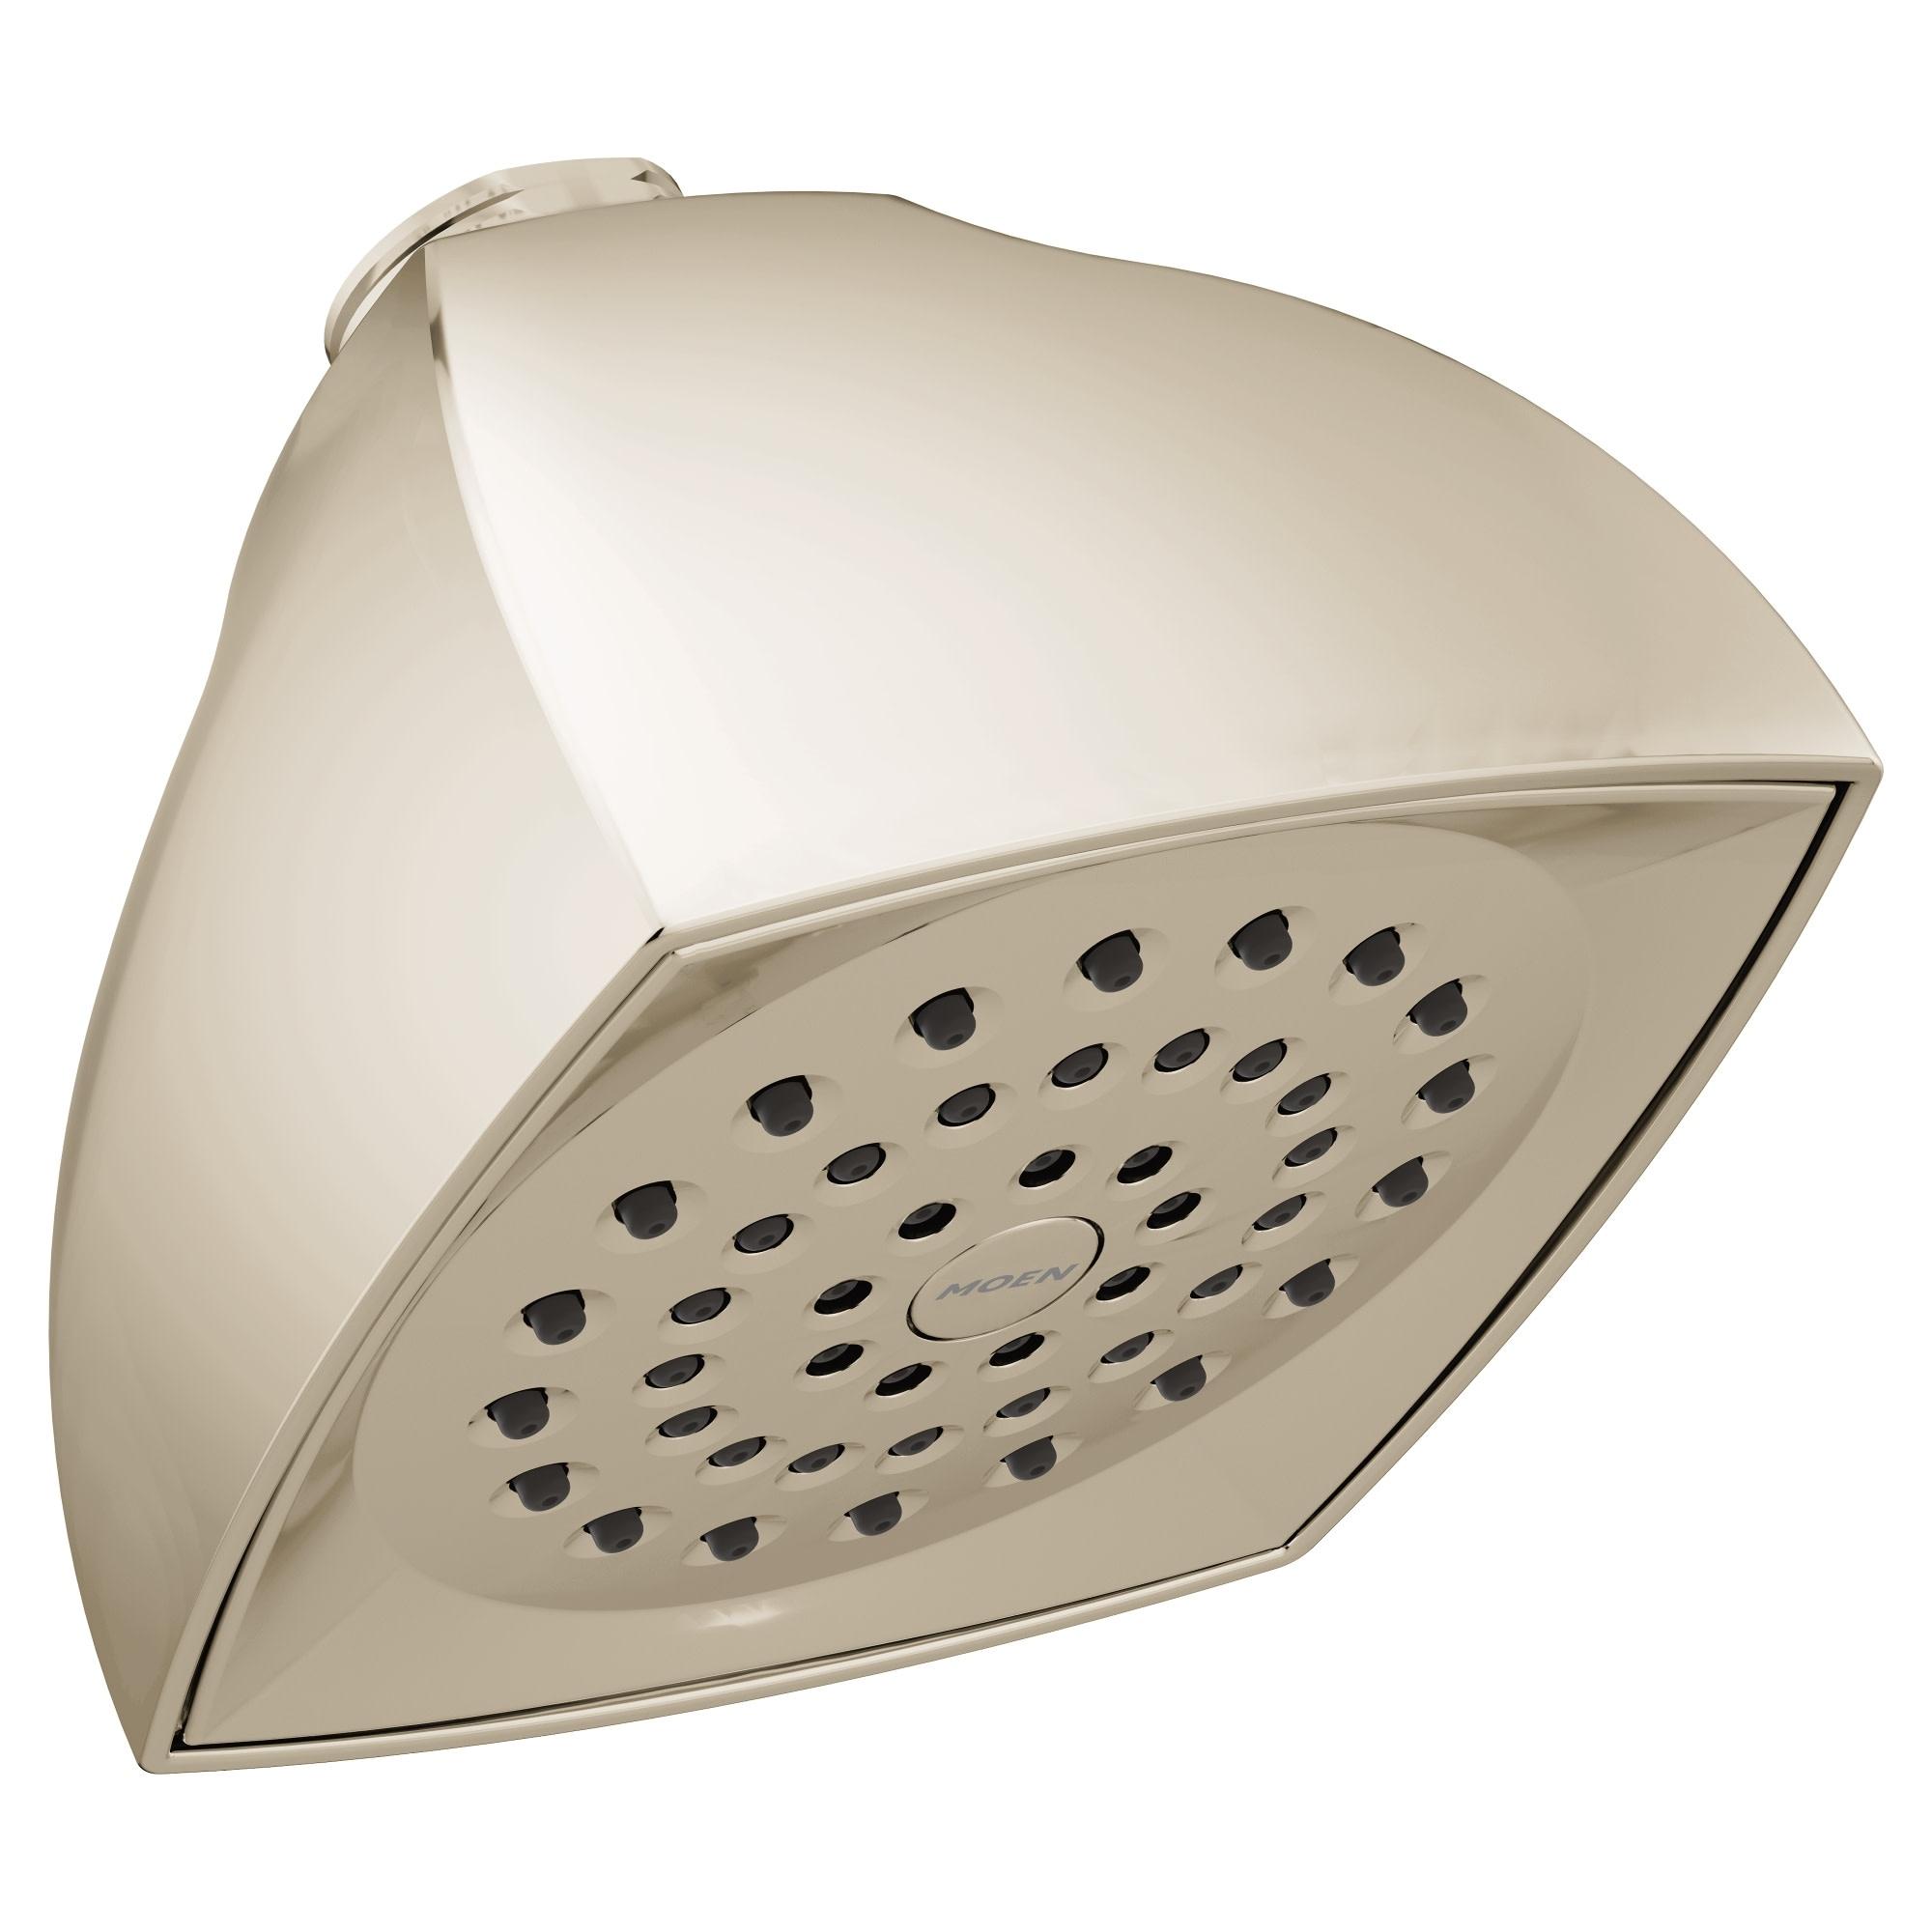 Moen 6325 Voss 2 5 Gpm Single Function Shower Head